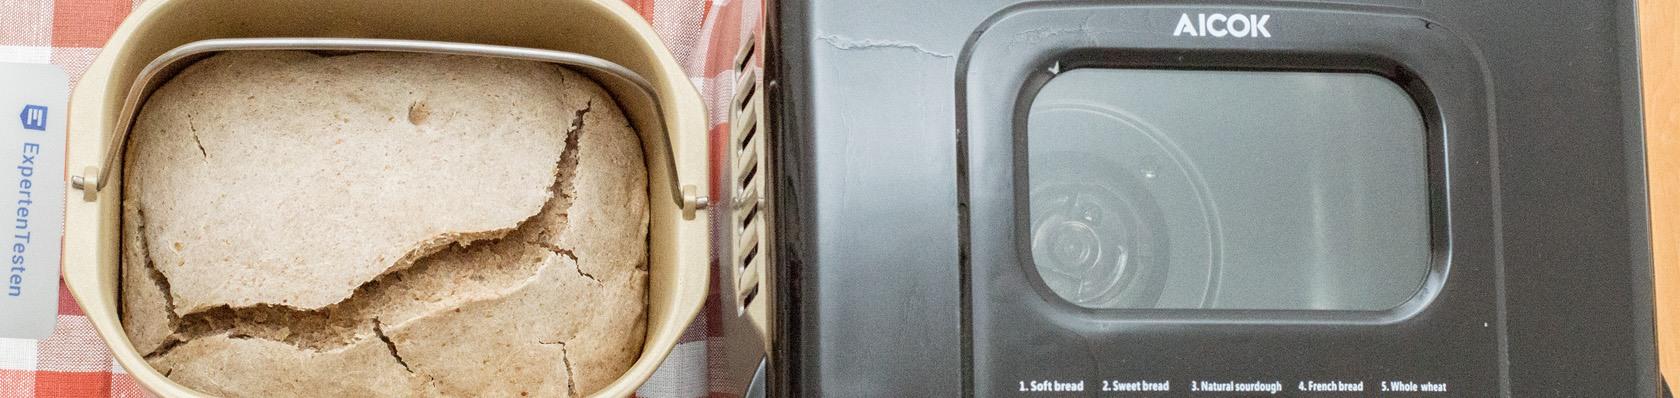 Brotbackautomaten im Test auf ExpertenTesten.de